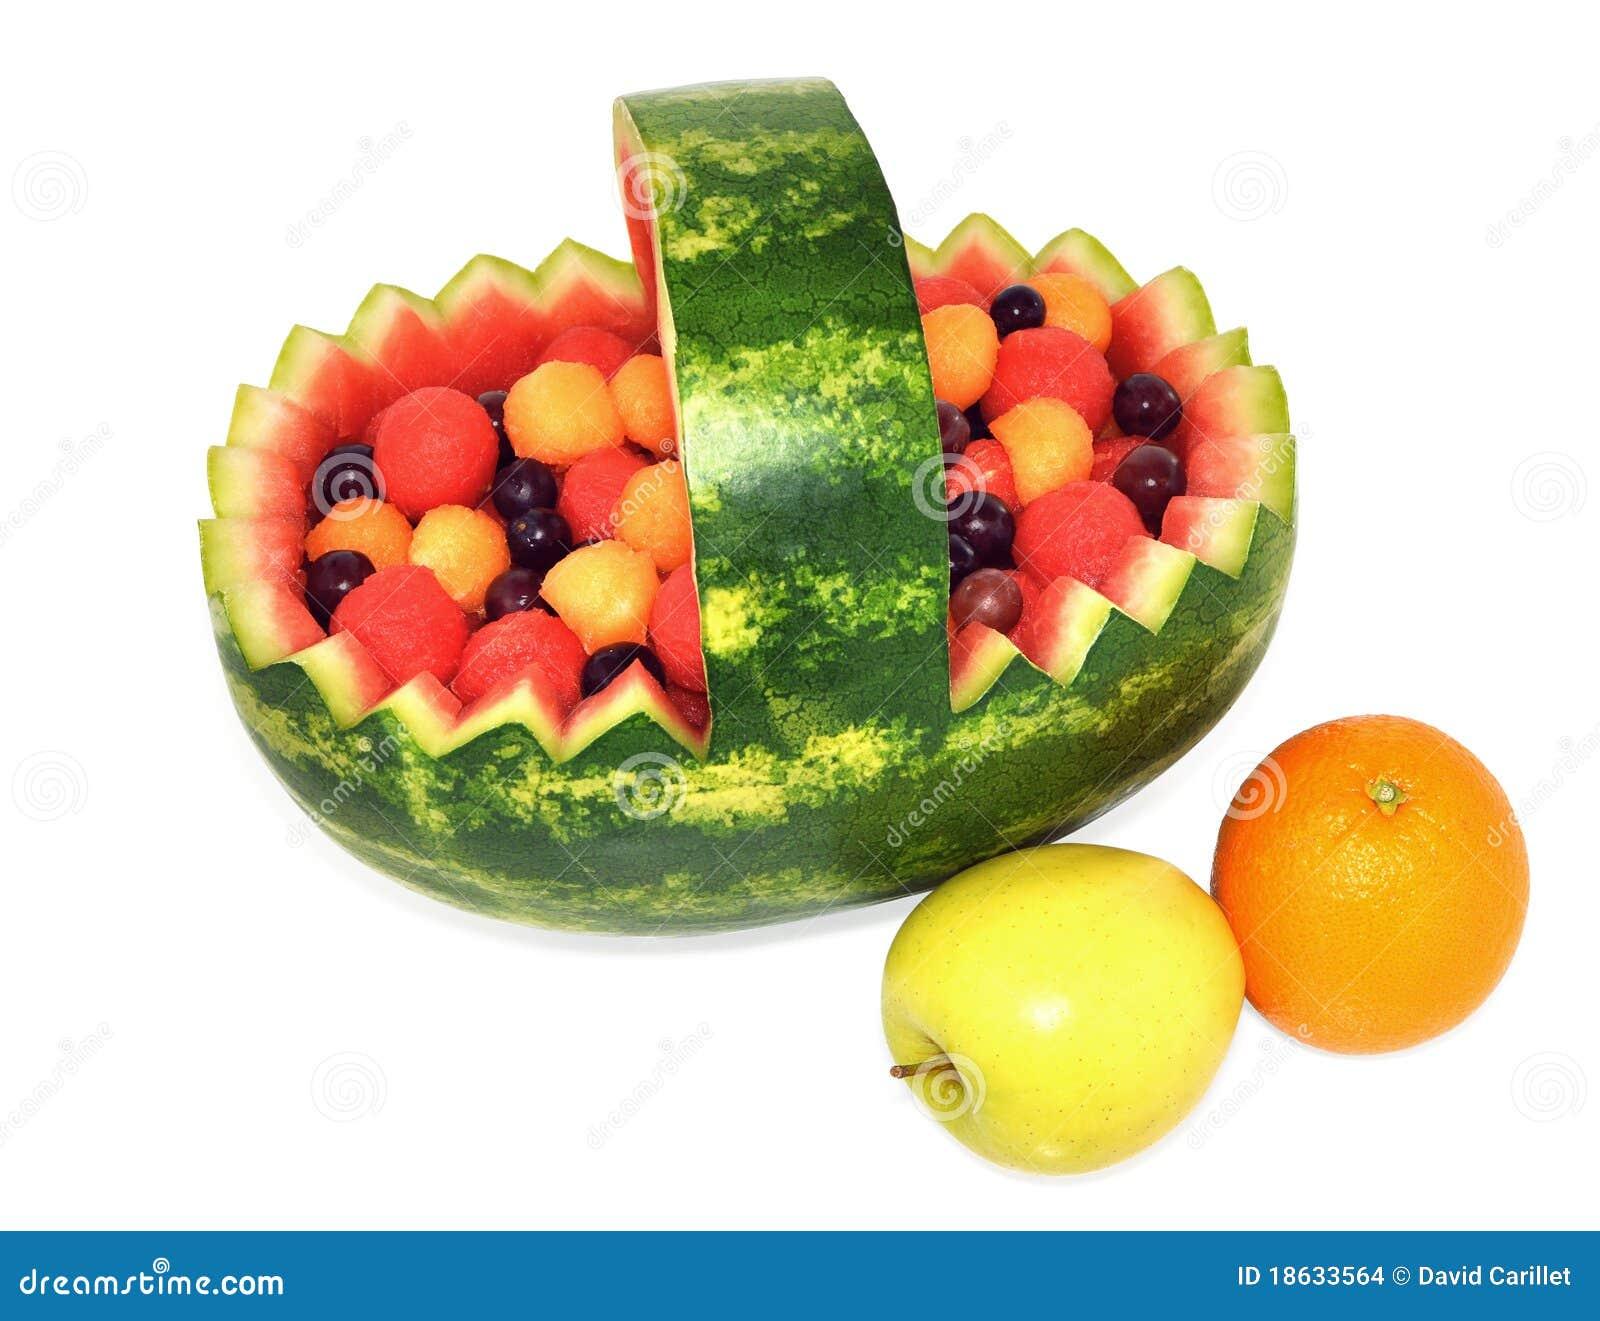 fruit delivery healthy fresh fruit salad